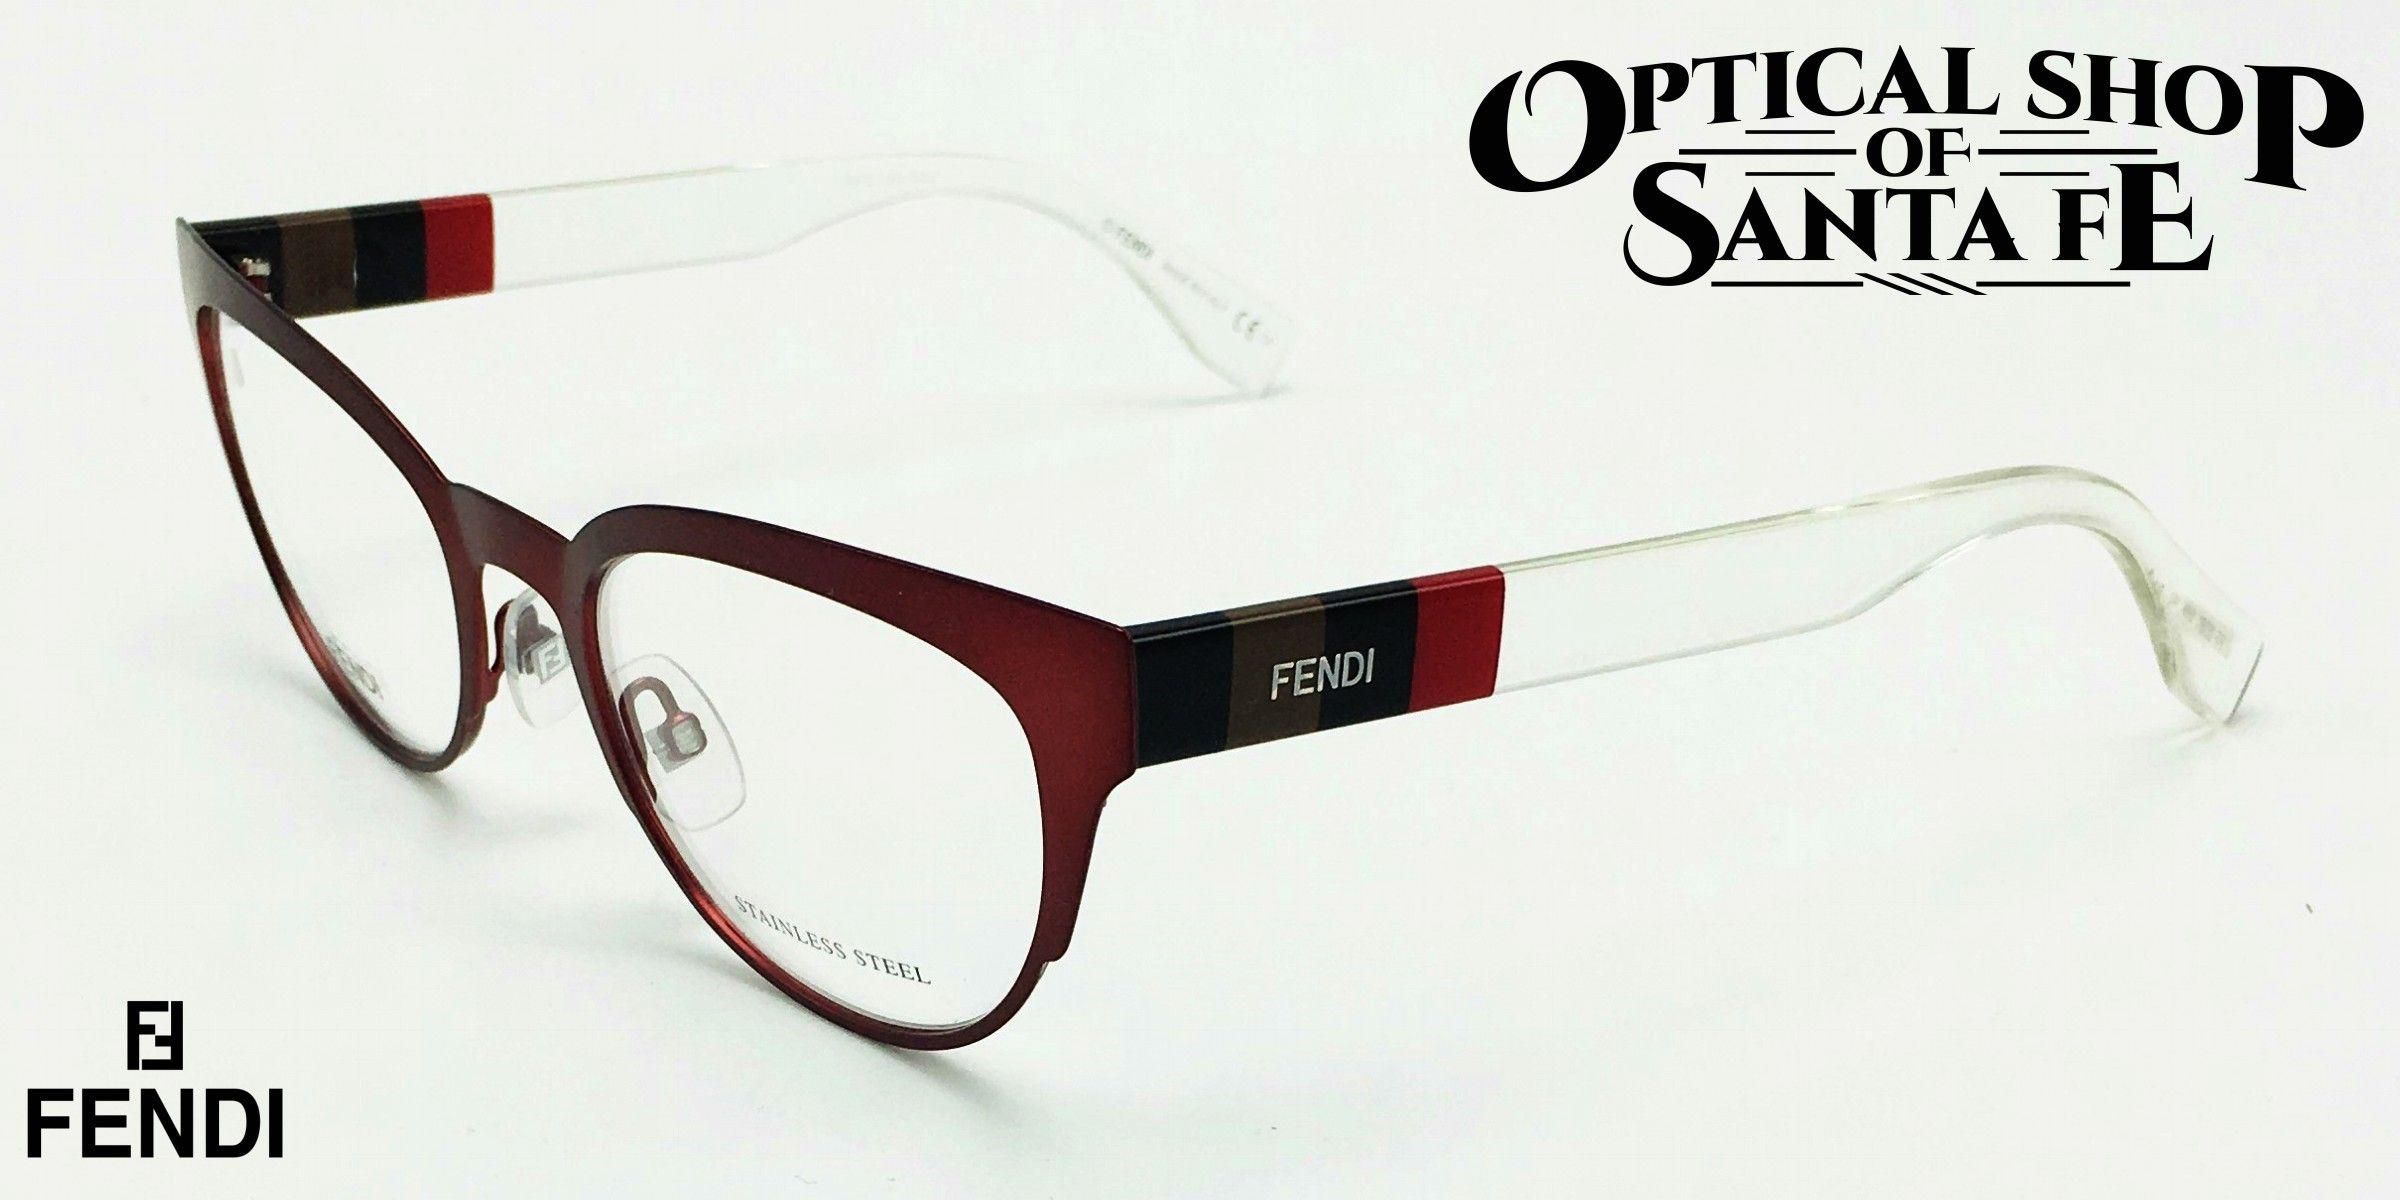 Fendi - Otical Eyeglass Frame | Fendi - Optical | Pinterest